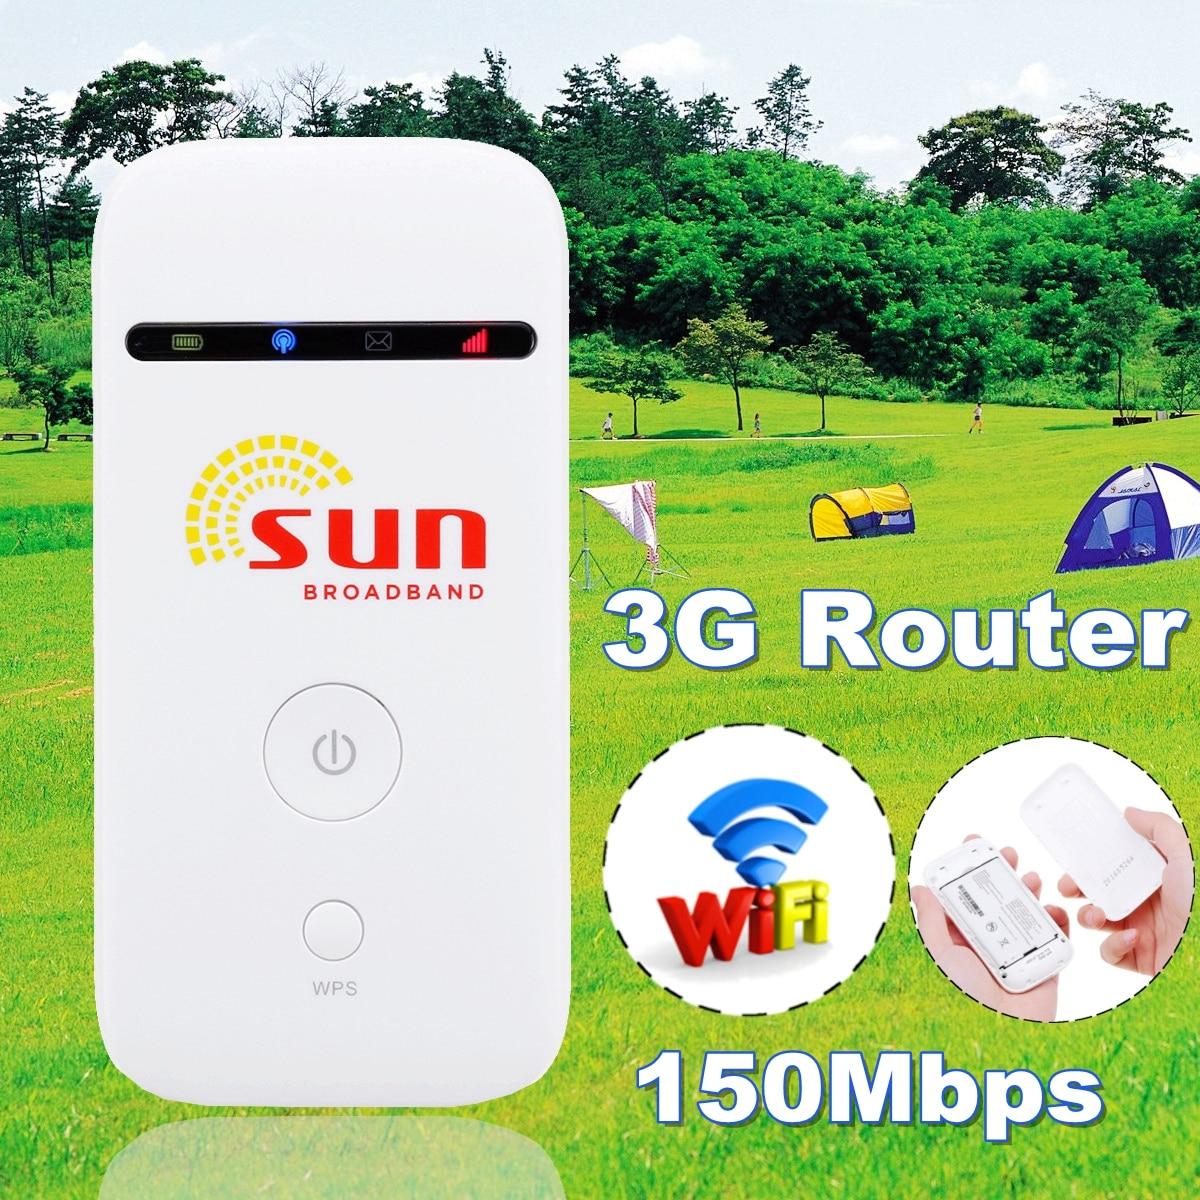 Routeur de poche sans fil Portable 3G WiFi MIFI sans filRouteur de poche sans fil Portable 3G WiFi MIFI sans fil